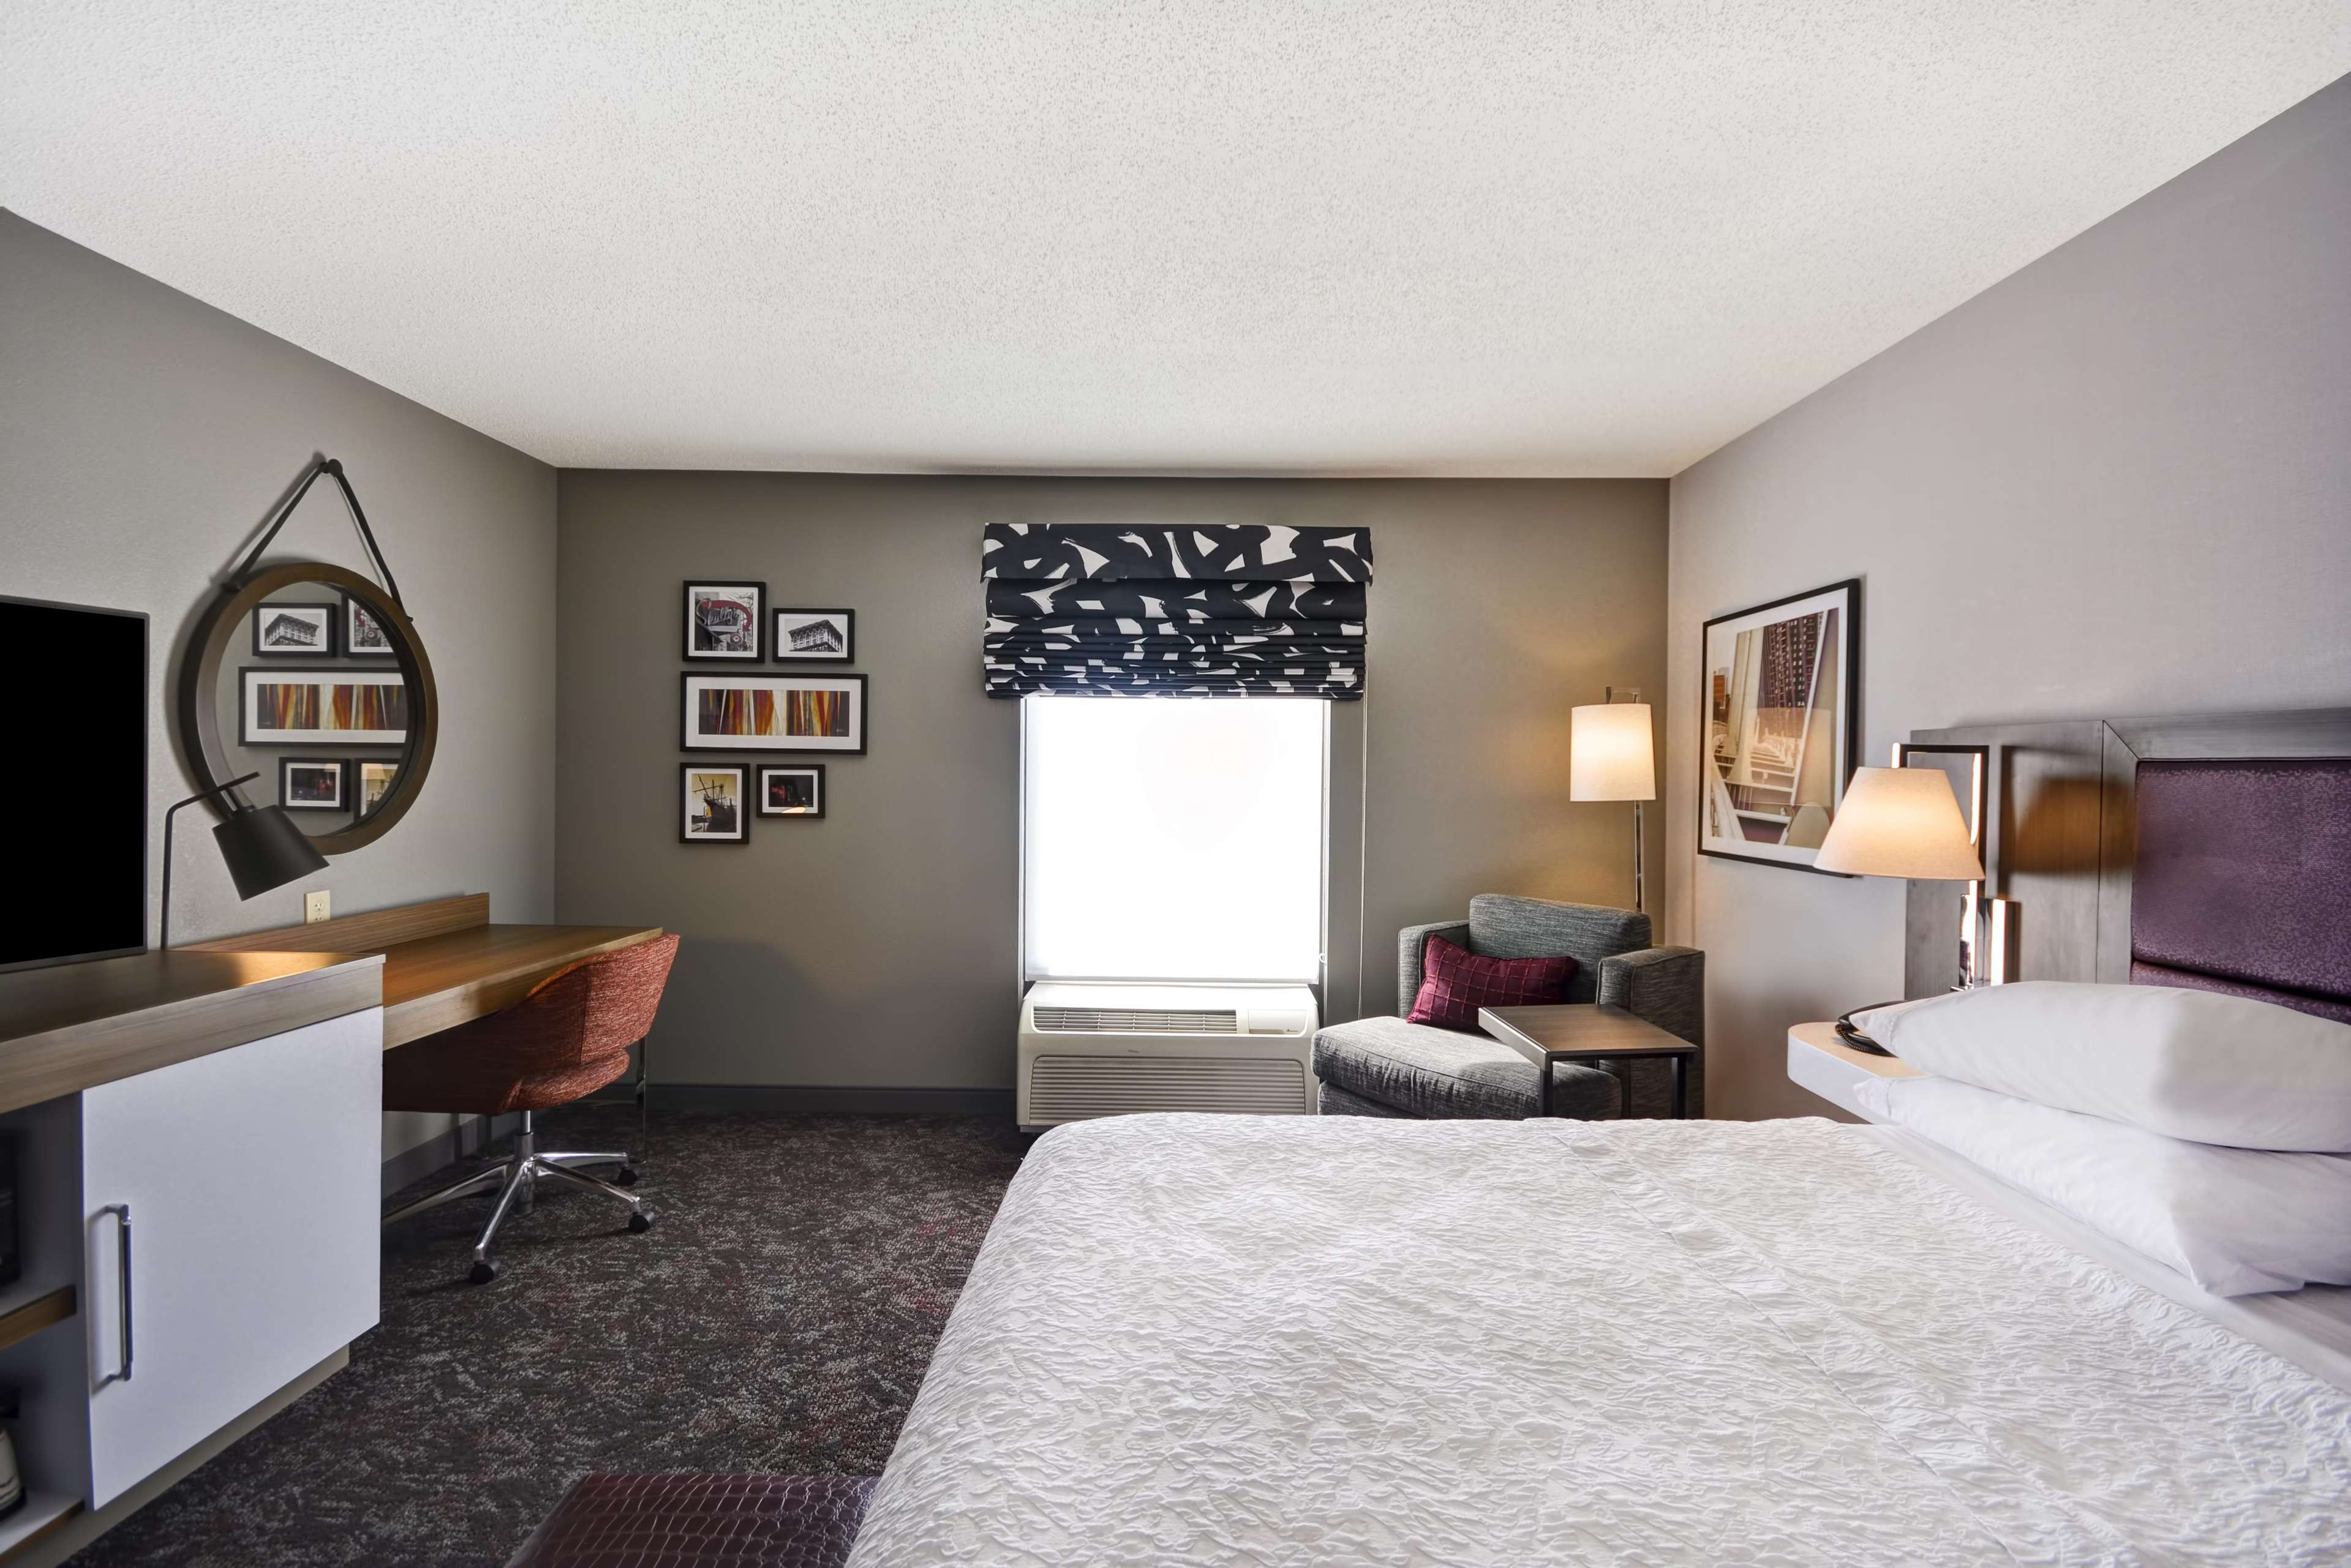 Hampton Inn & Suites Columbus-Easton Area image 39